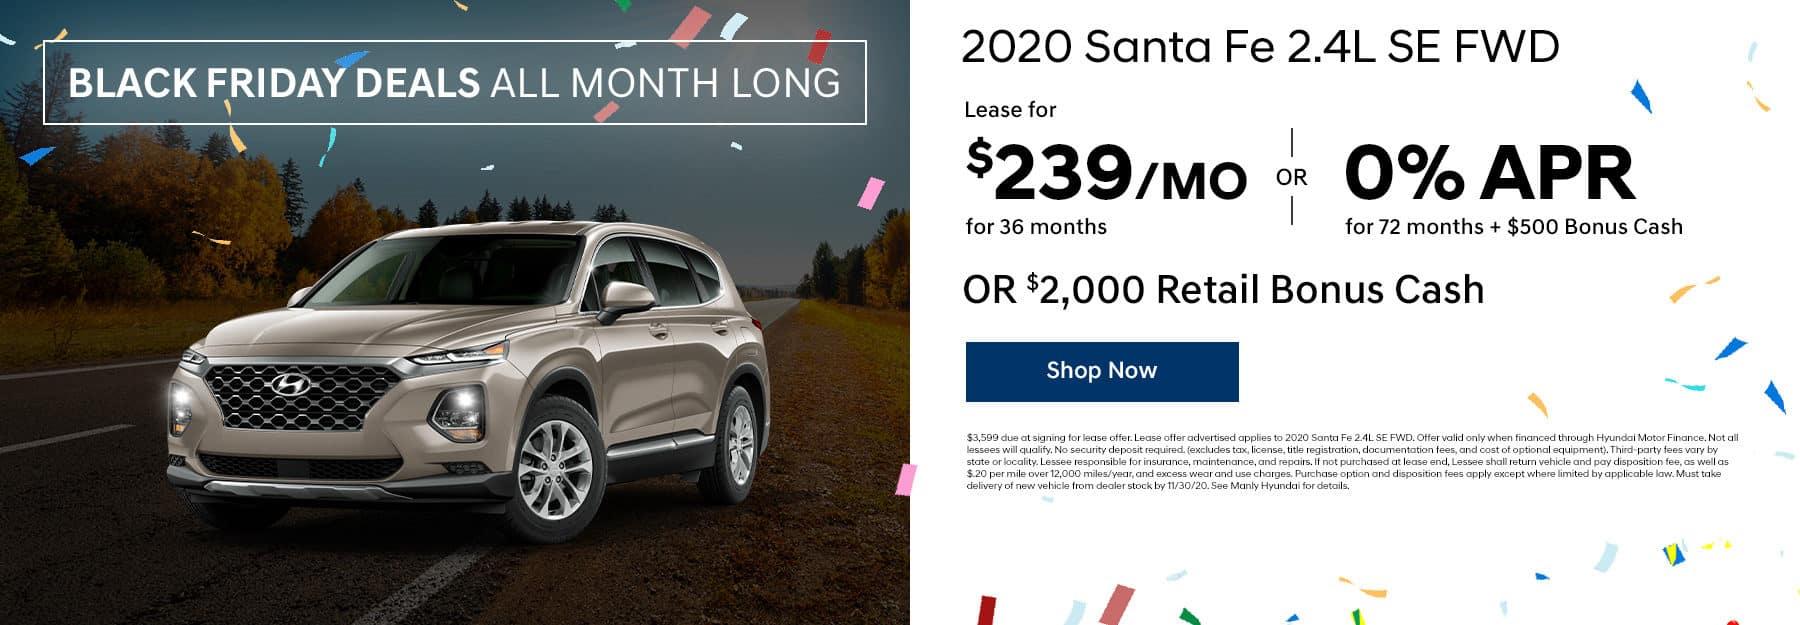 2020 Santa Fe 2.4L lease, apr, and cash offer